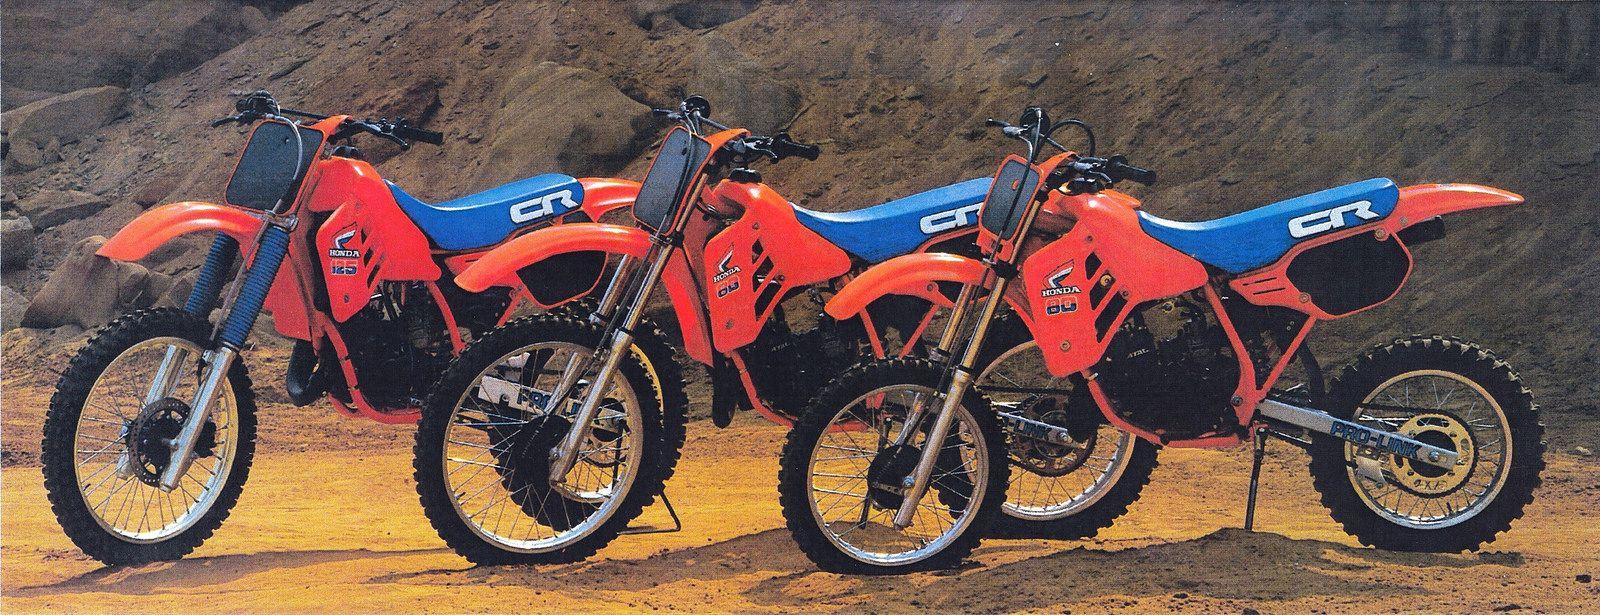 1985 Honda Cr125r Cr80r Ii And Cr80r Vintage Motocross Honda Honda Dirt Bike